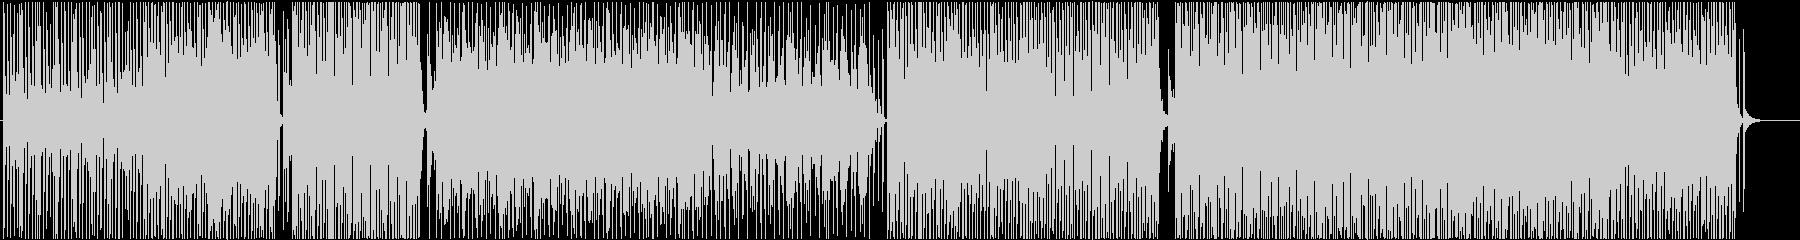 midテンポ-EDM-ハウス-PV-軽快の未再生の波形